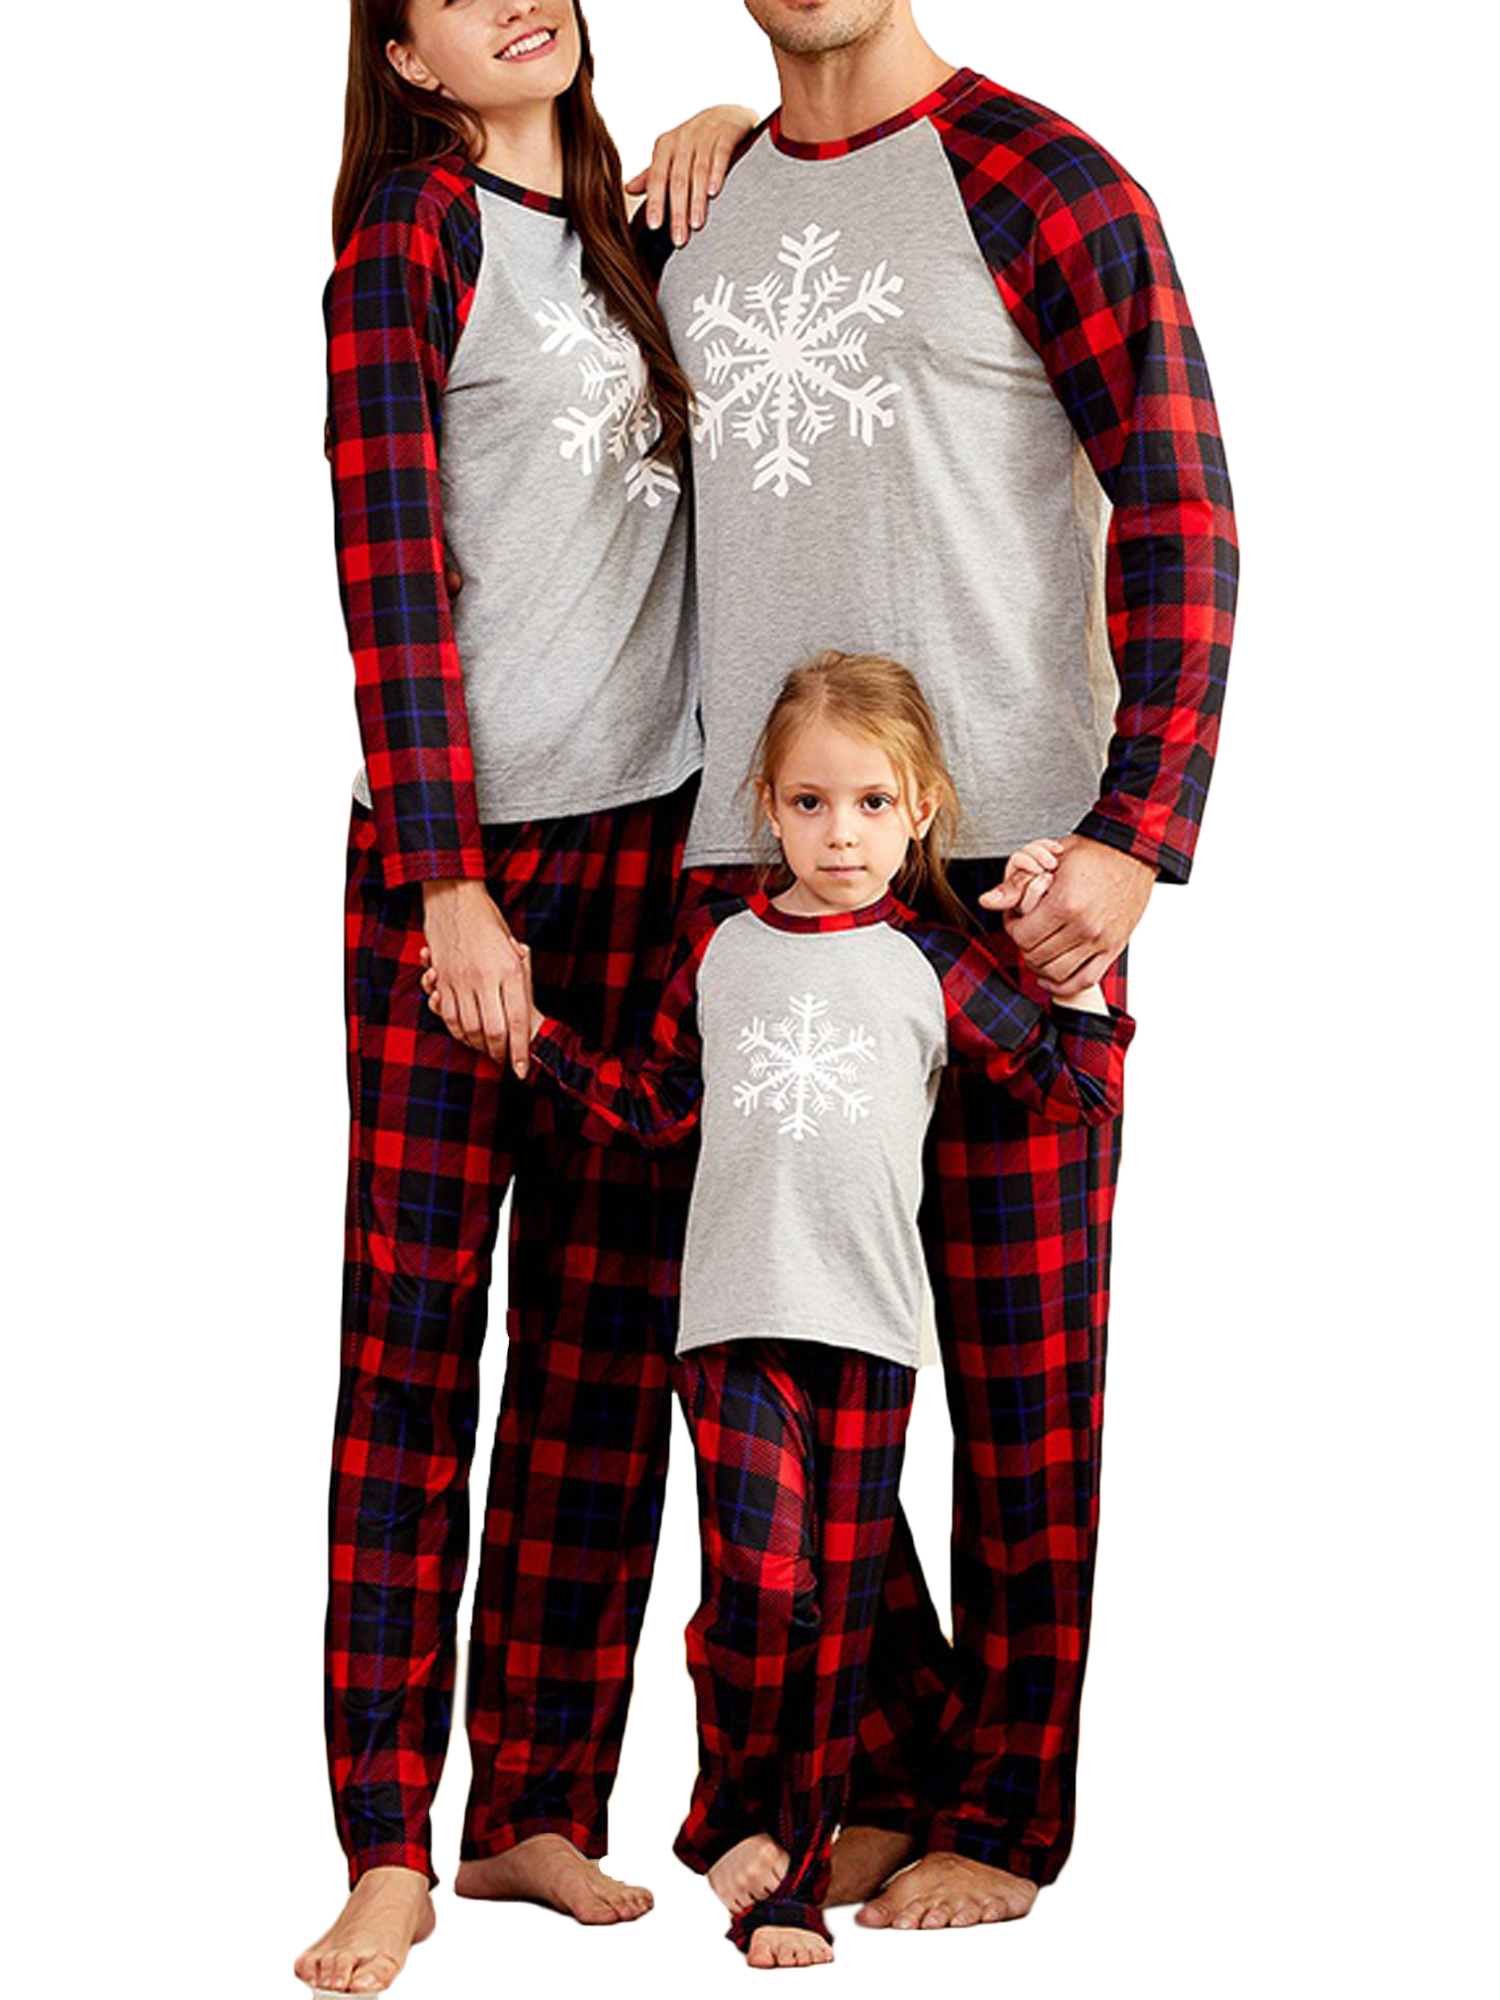 1-2Years, Kid 2020 Family Matching Pyjamas Set,Matching Christmas Pyjamas,for Family Women Men Kids Baby Red Plaid Santa Claus with a mask print Loungewear